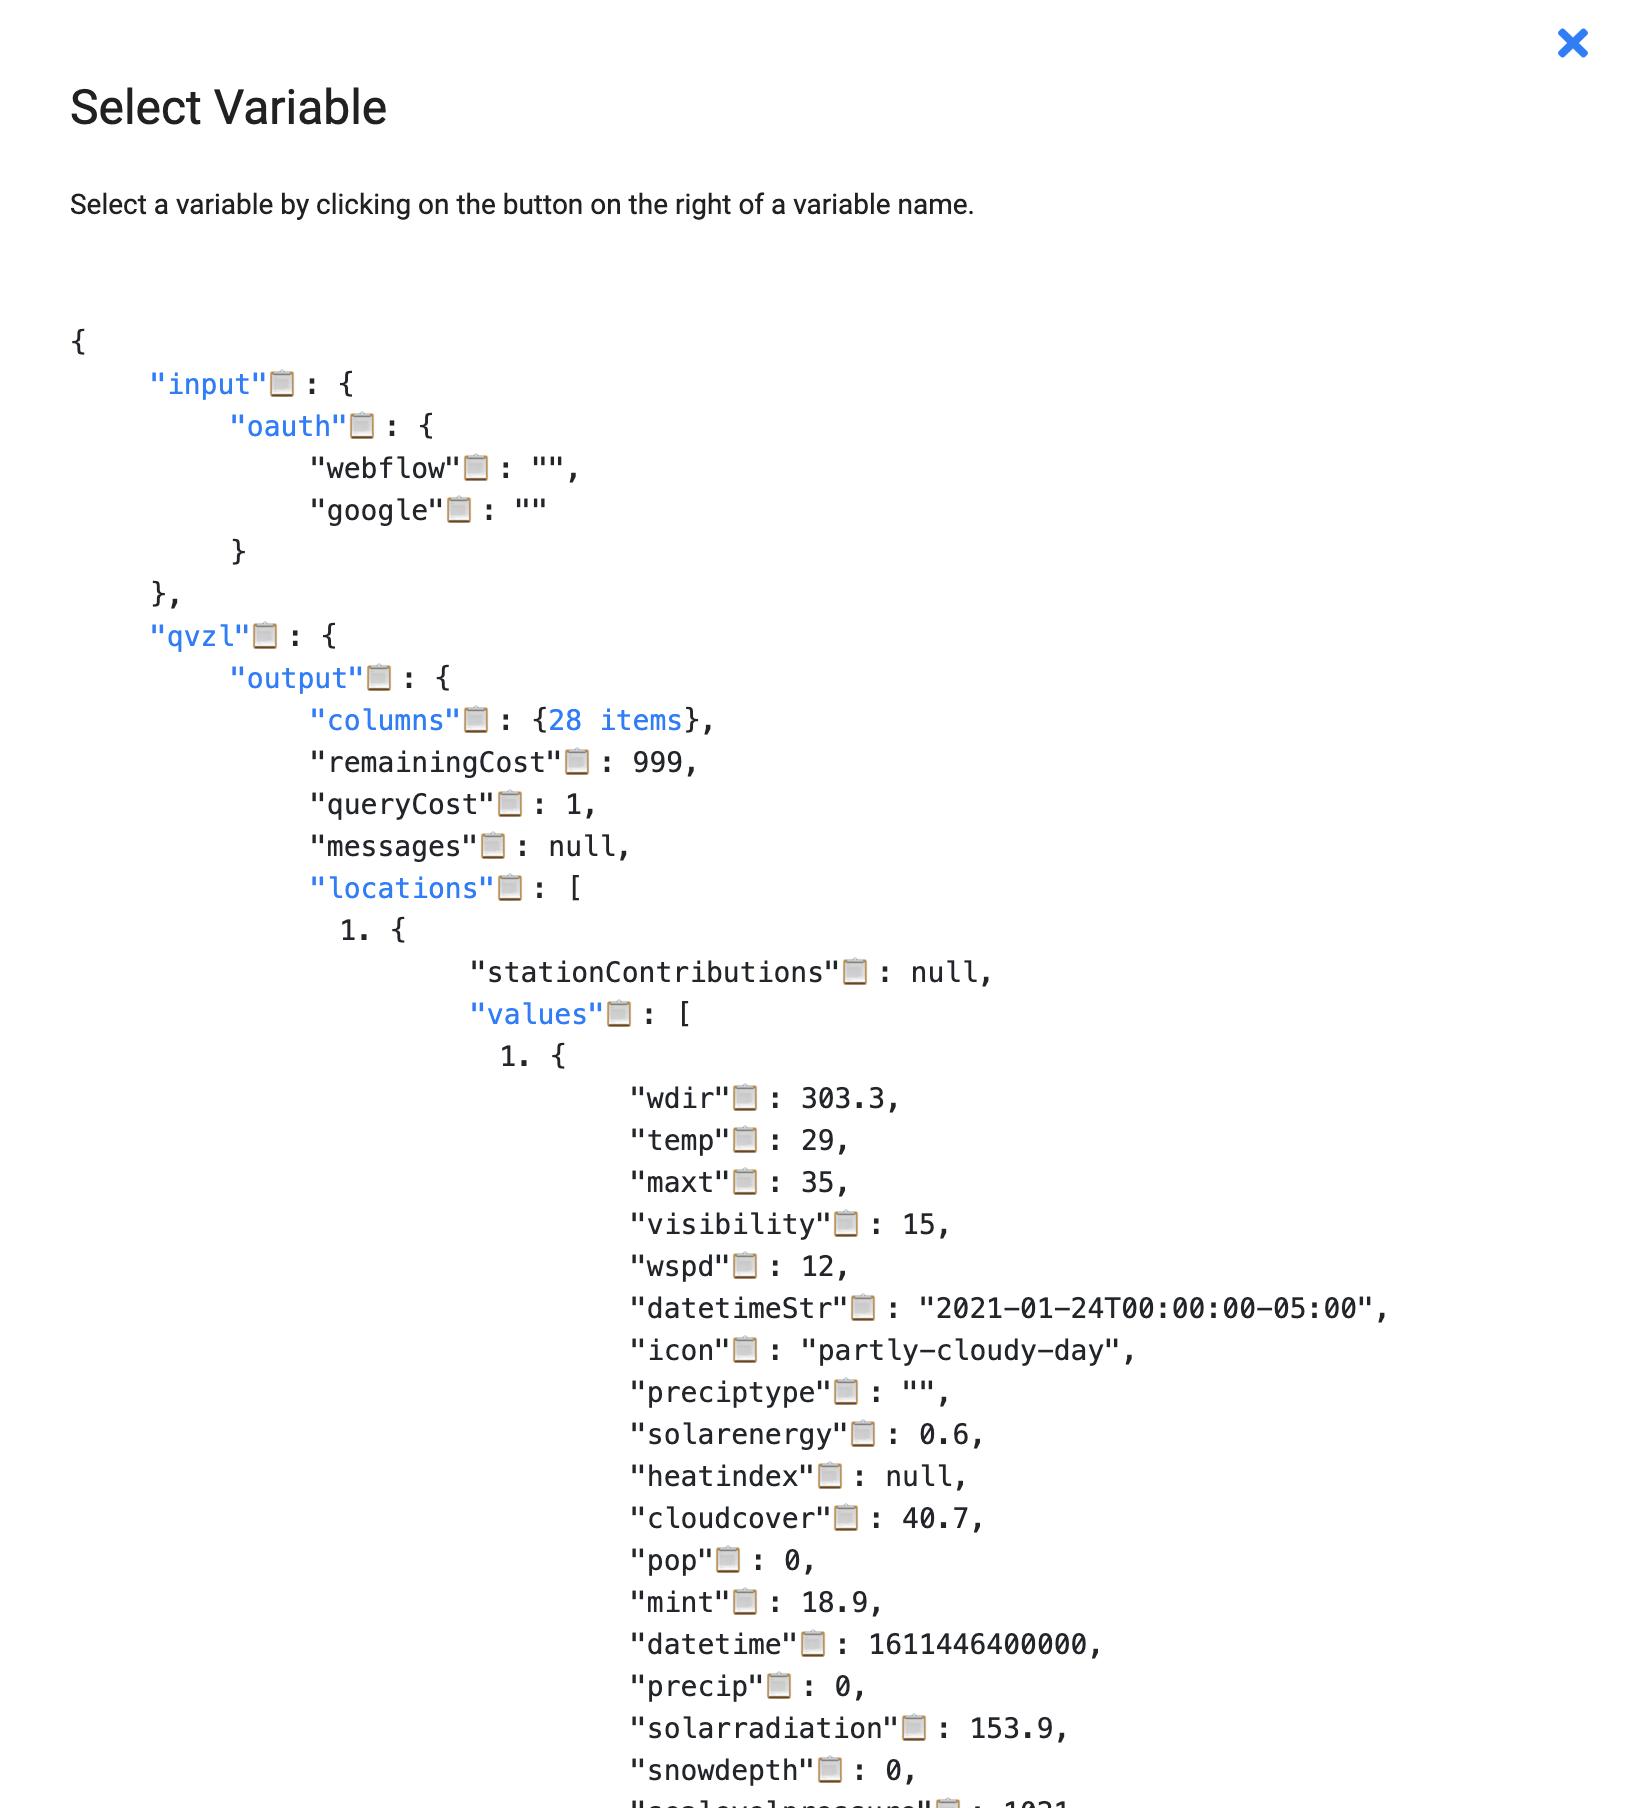 Byteline Select Variable Dialog